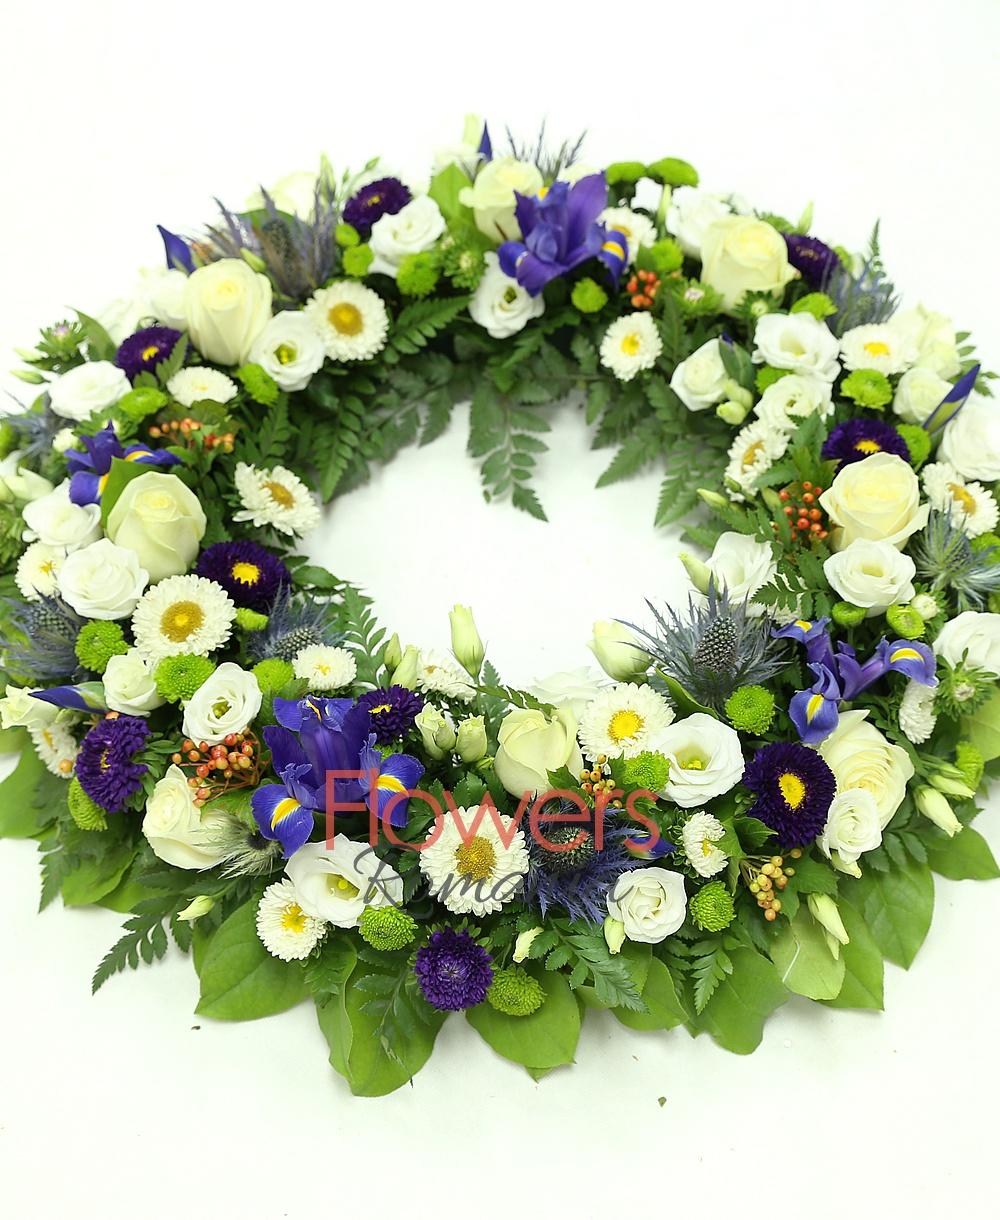 Livrare funeral wreath funeral wreath izmirmasajfo Gallery